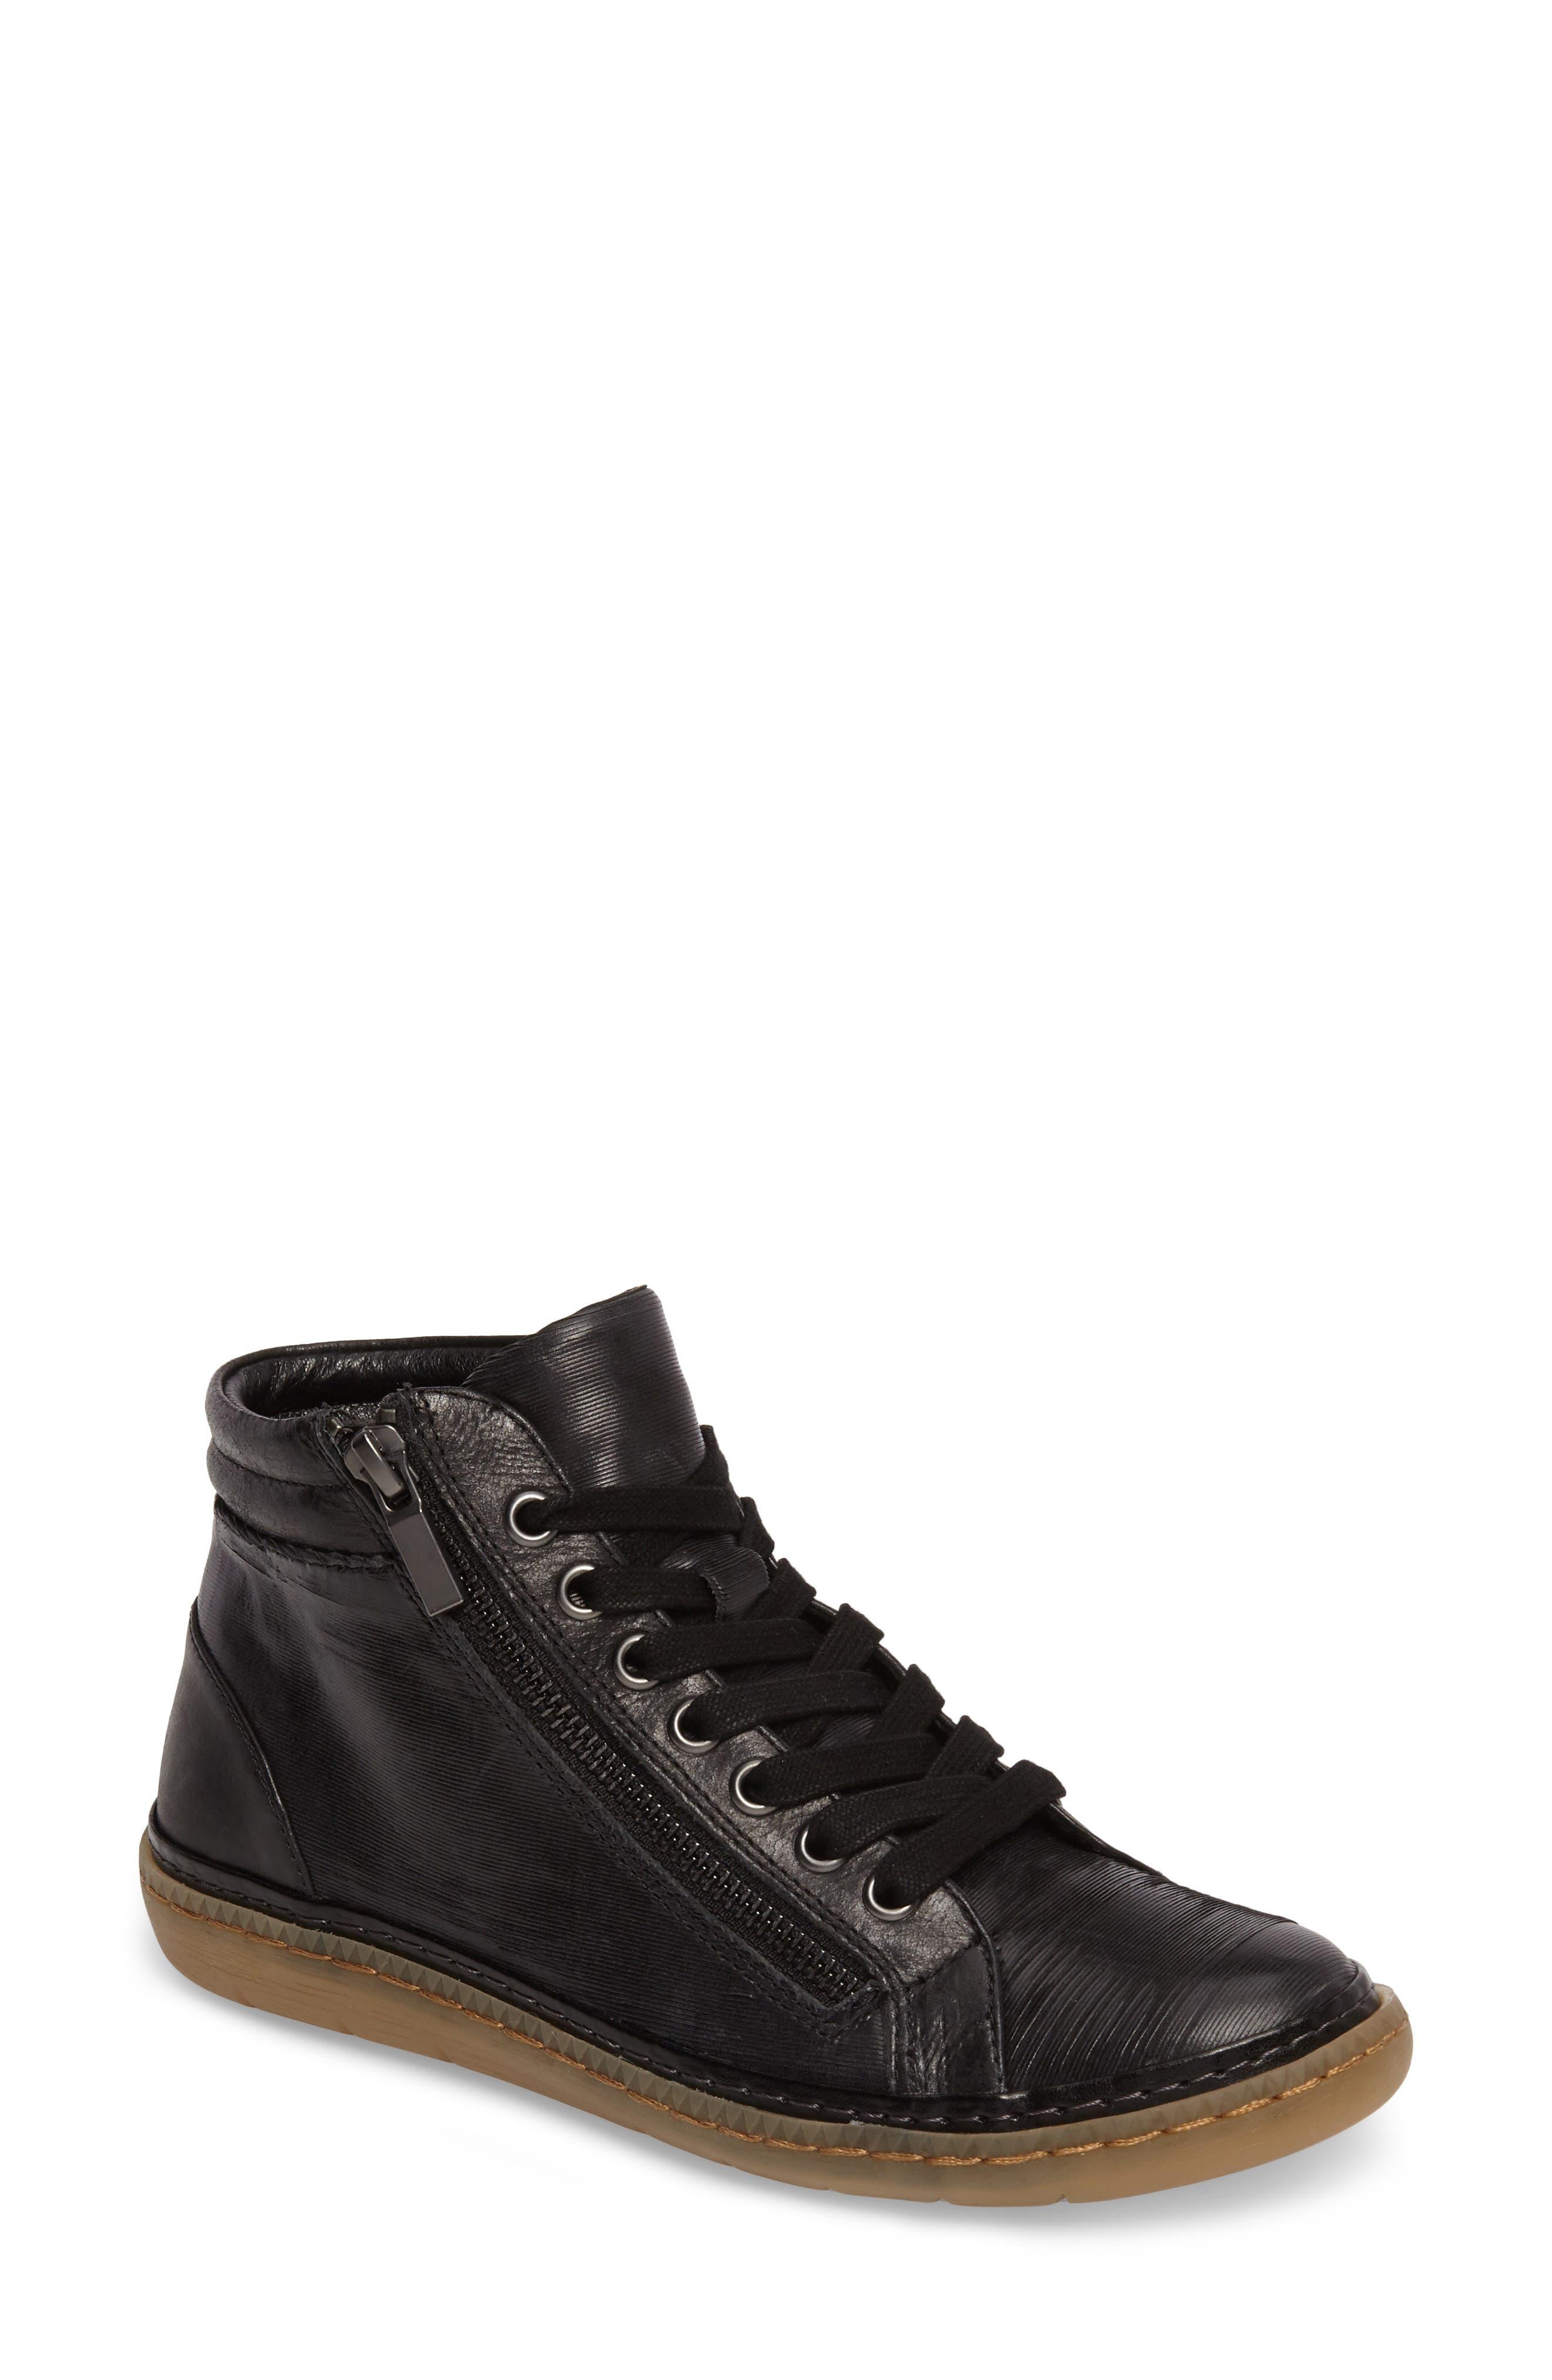 Annaleigh High Top Sneaker,                         Main,                         color, 001